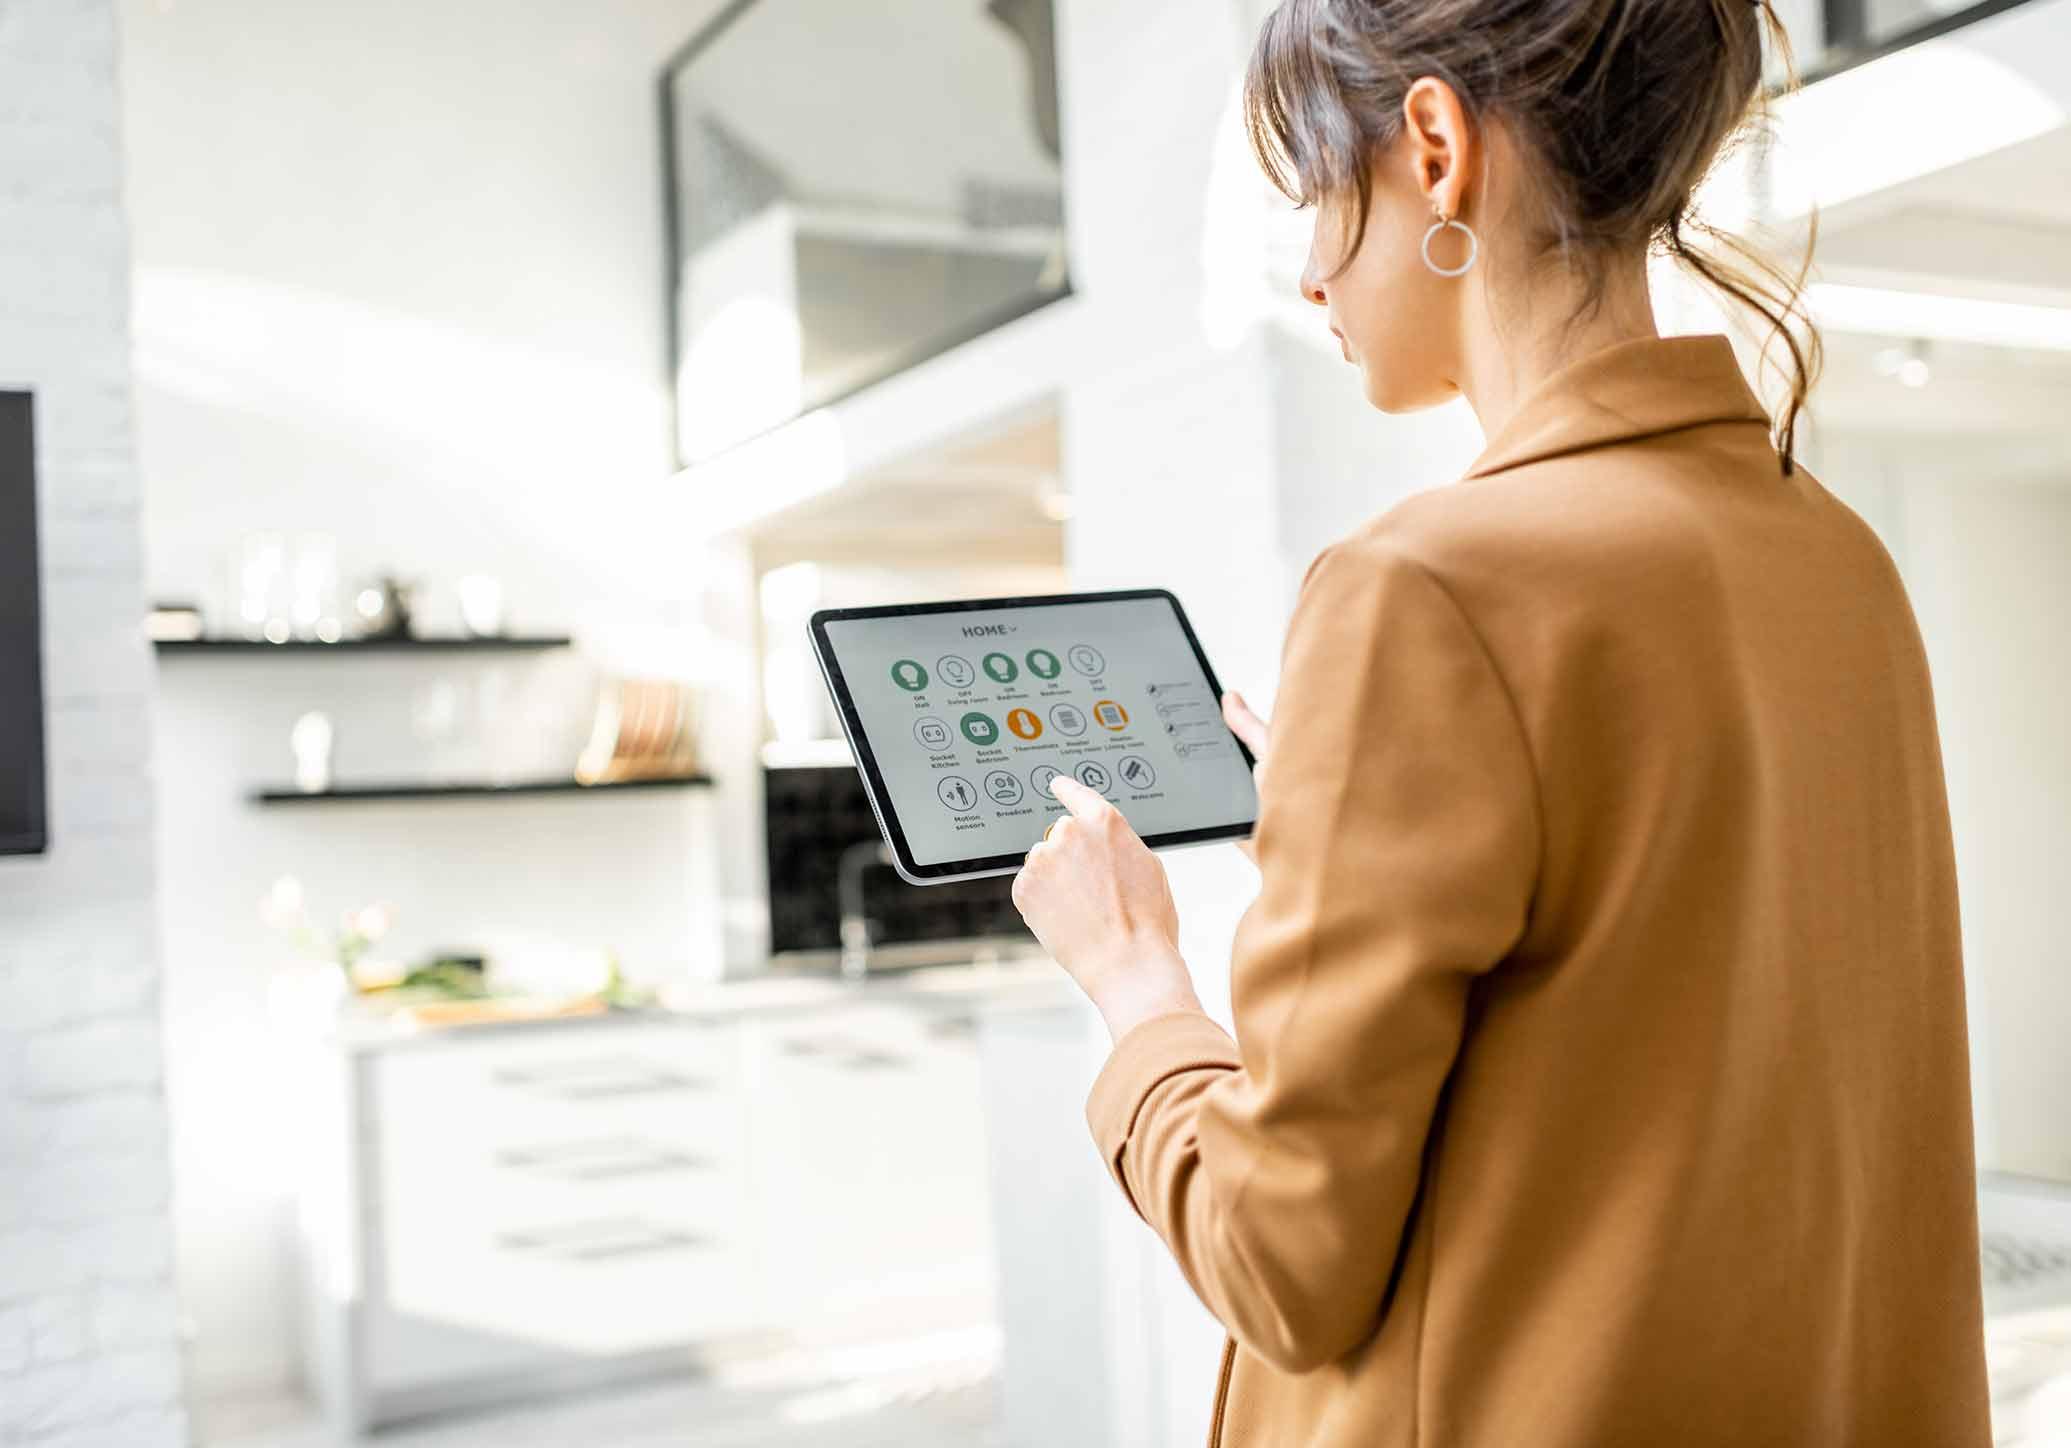 Casa inteligente: 9 dispositivos para poupar energia